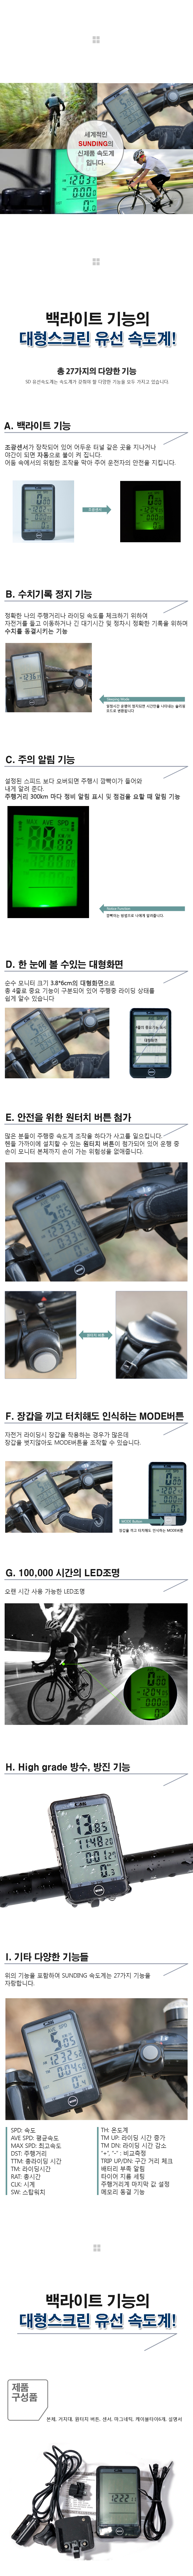 bikeline_list02.jpg